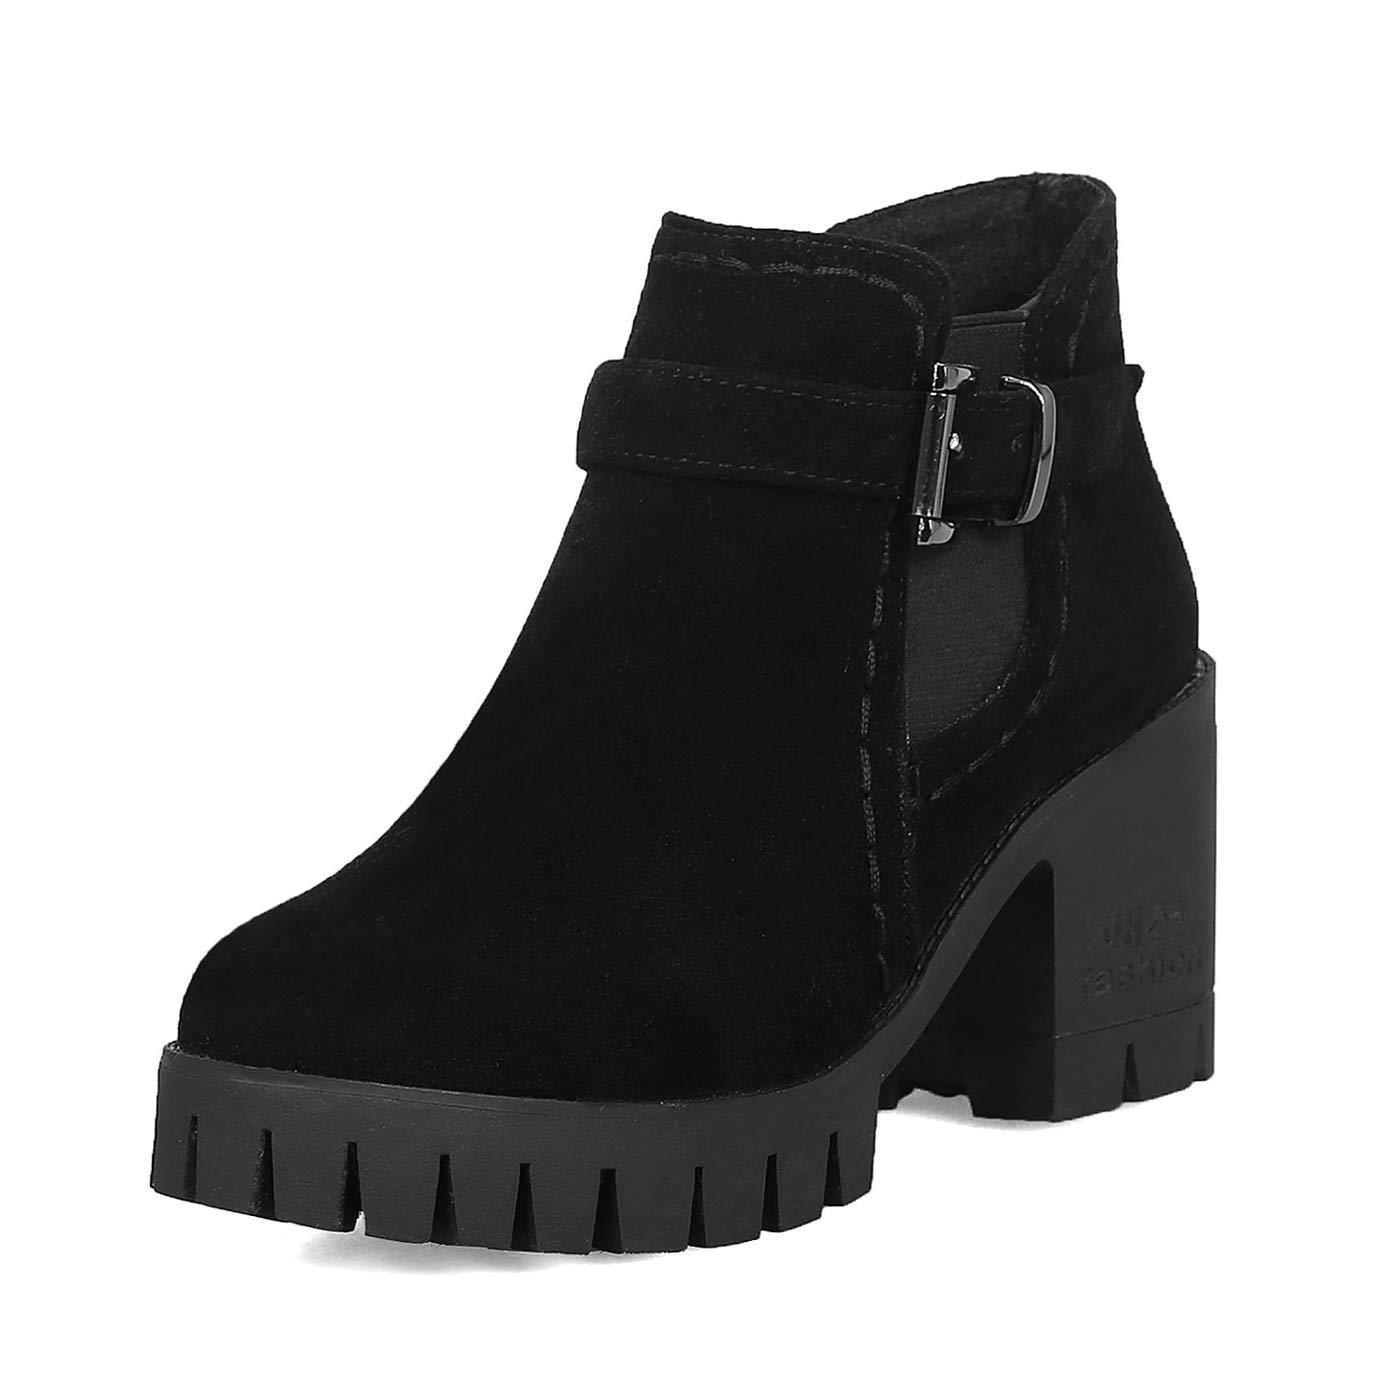 fabf7f1db CYBLING Women's Elastic Lug Sole Platform Chunky Ankle Boots Thigh High  Chelsea Booties: Amazon.ca: Shoes & Handbags